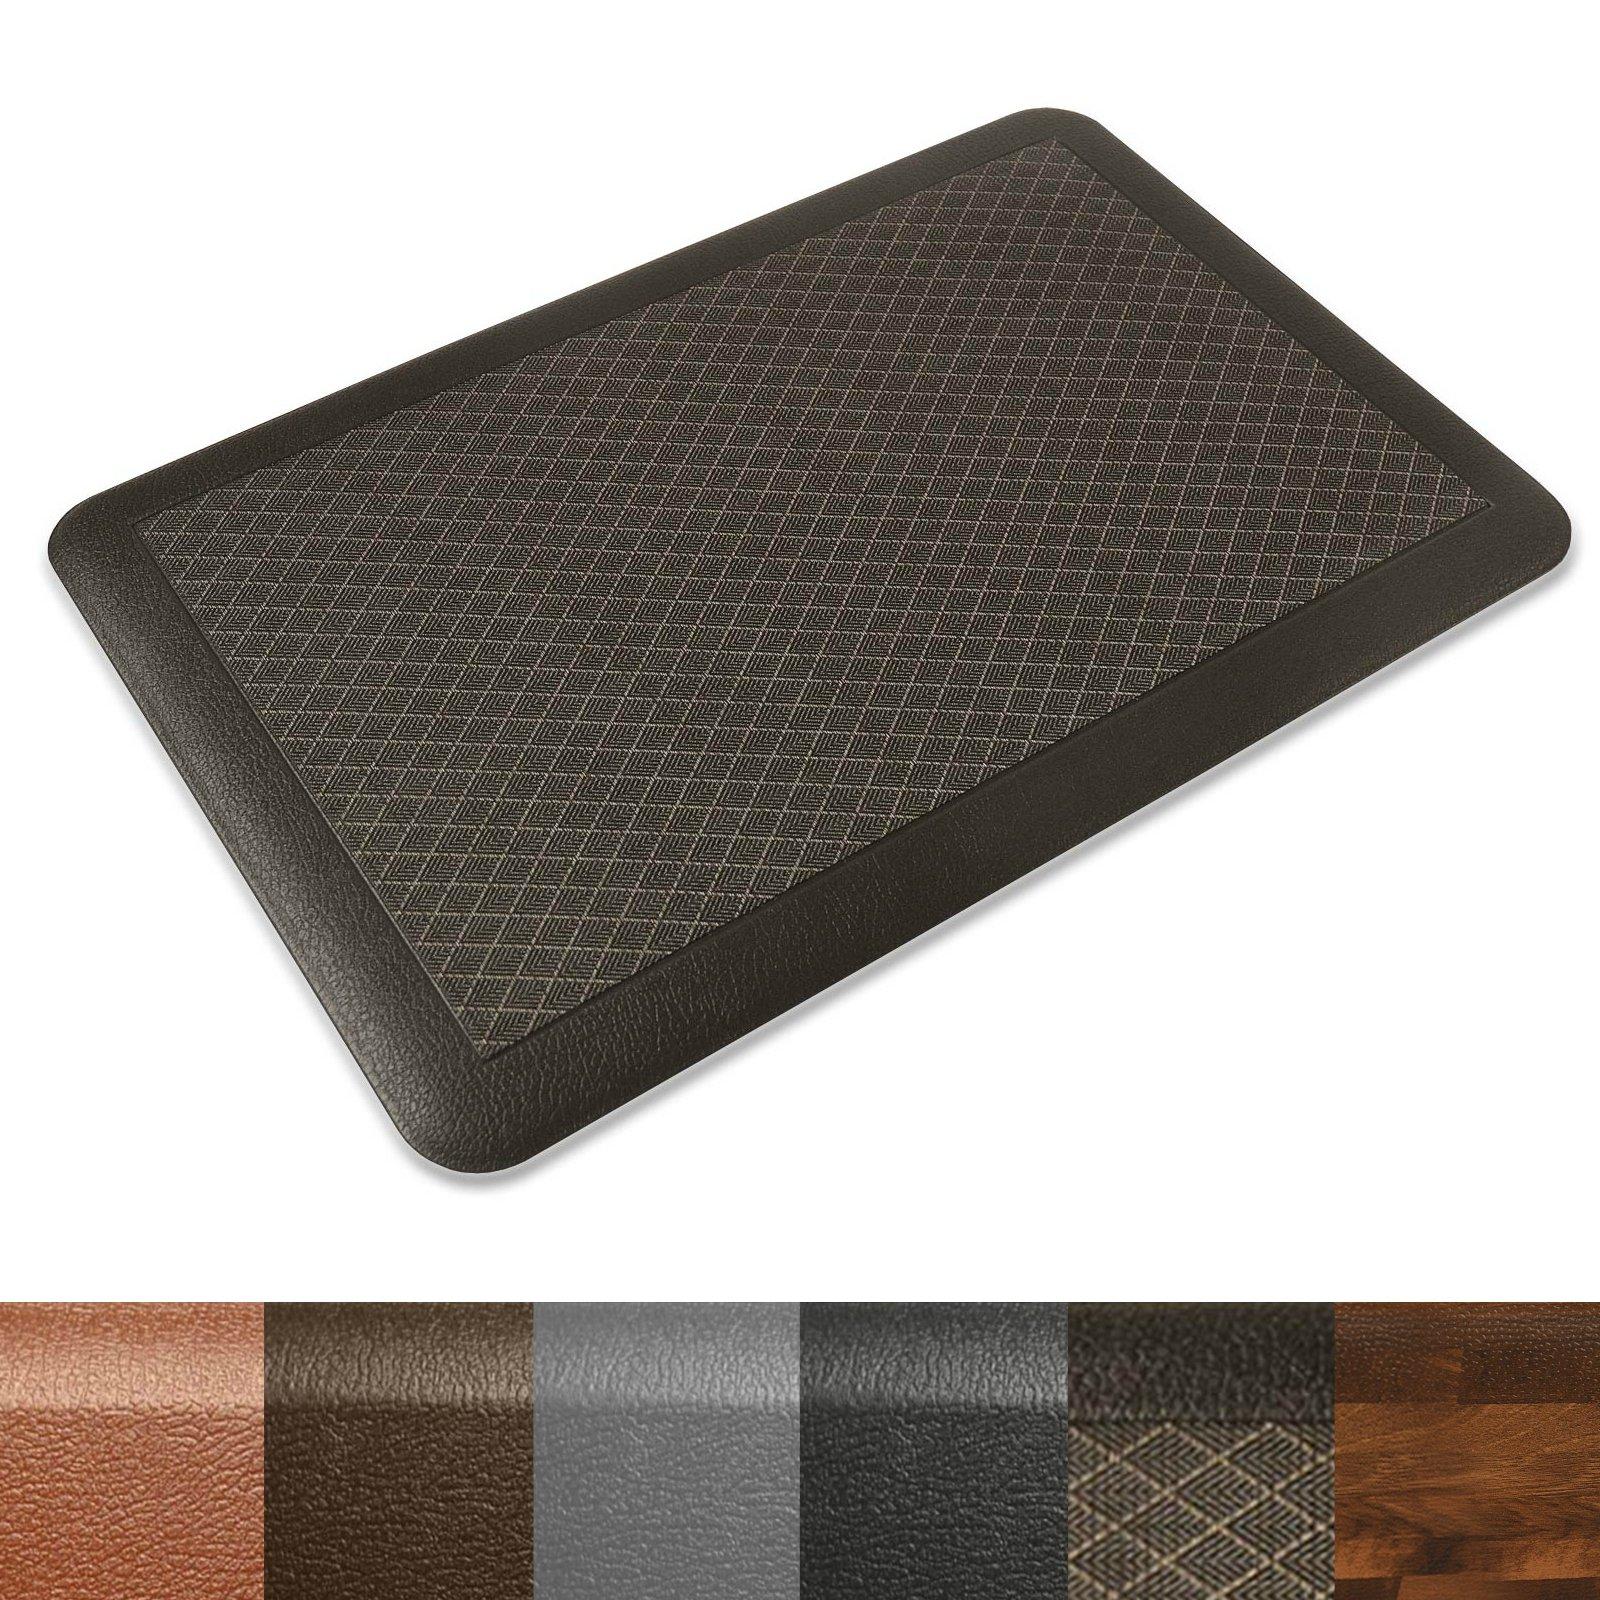 Kitchen Mat | Anti Fatigue Mat, 3/4 Thick | Ergonomically Engineered, Non-Slip, Waterproof | 20''x30'' - Dark Brown